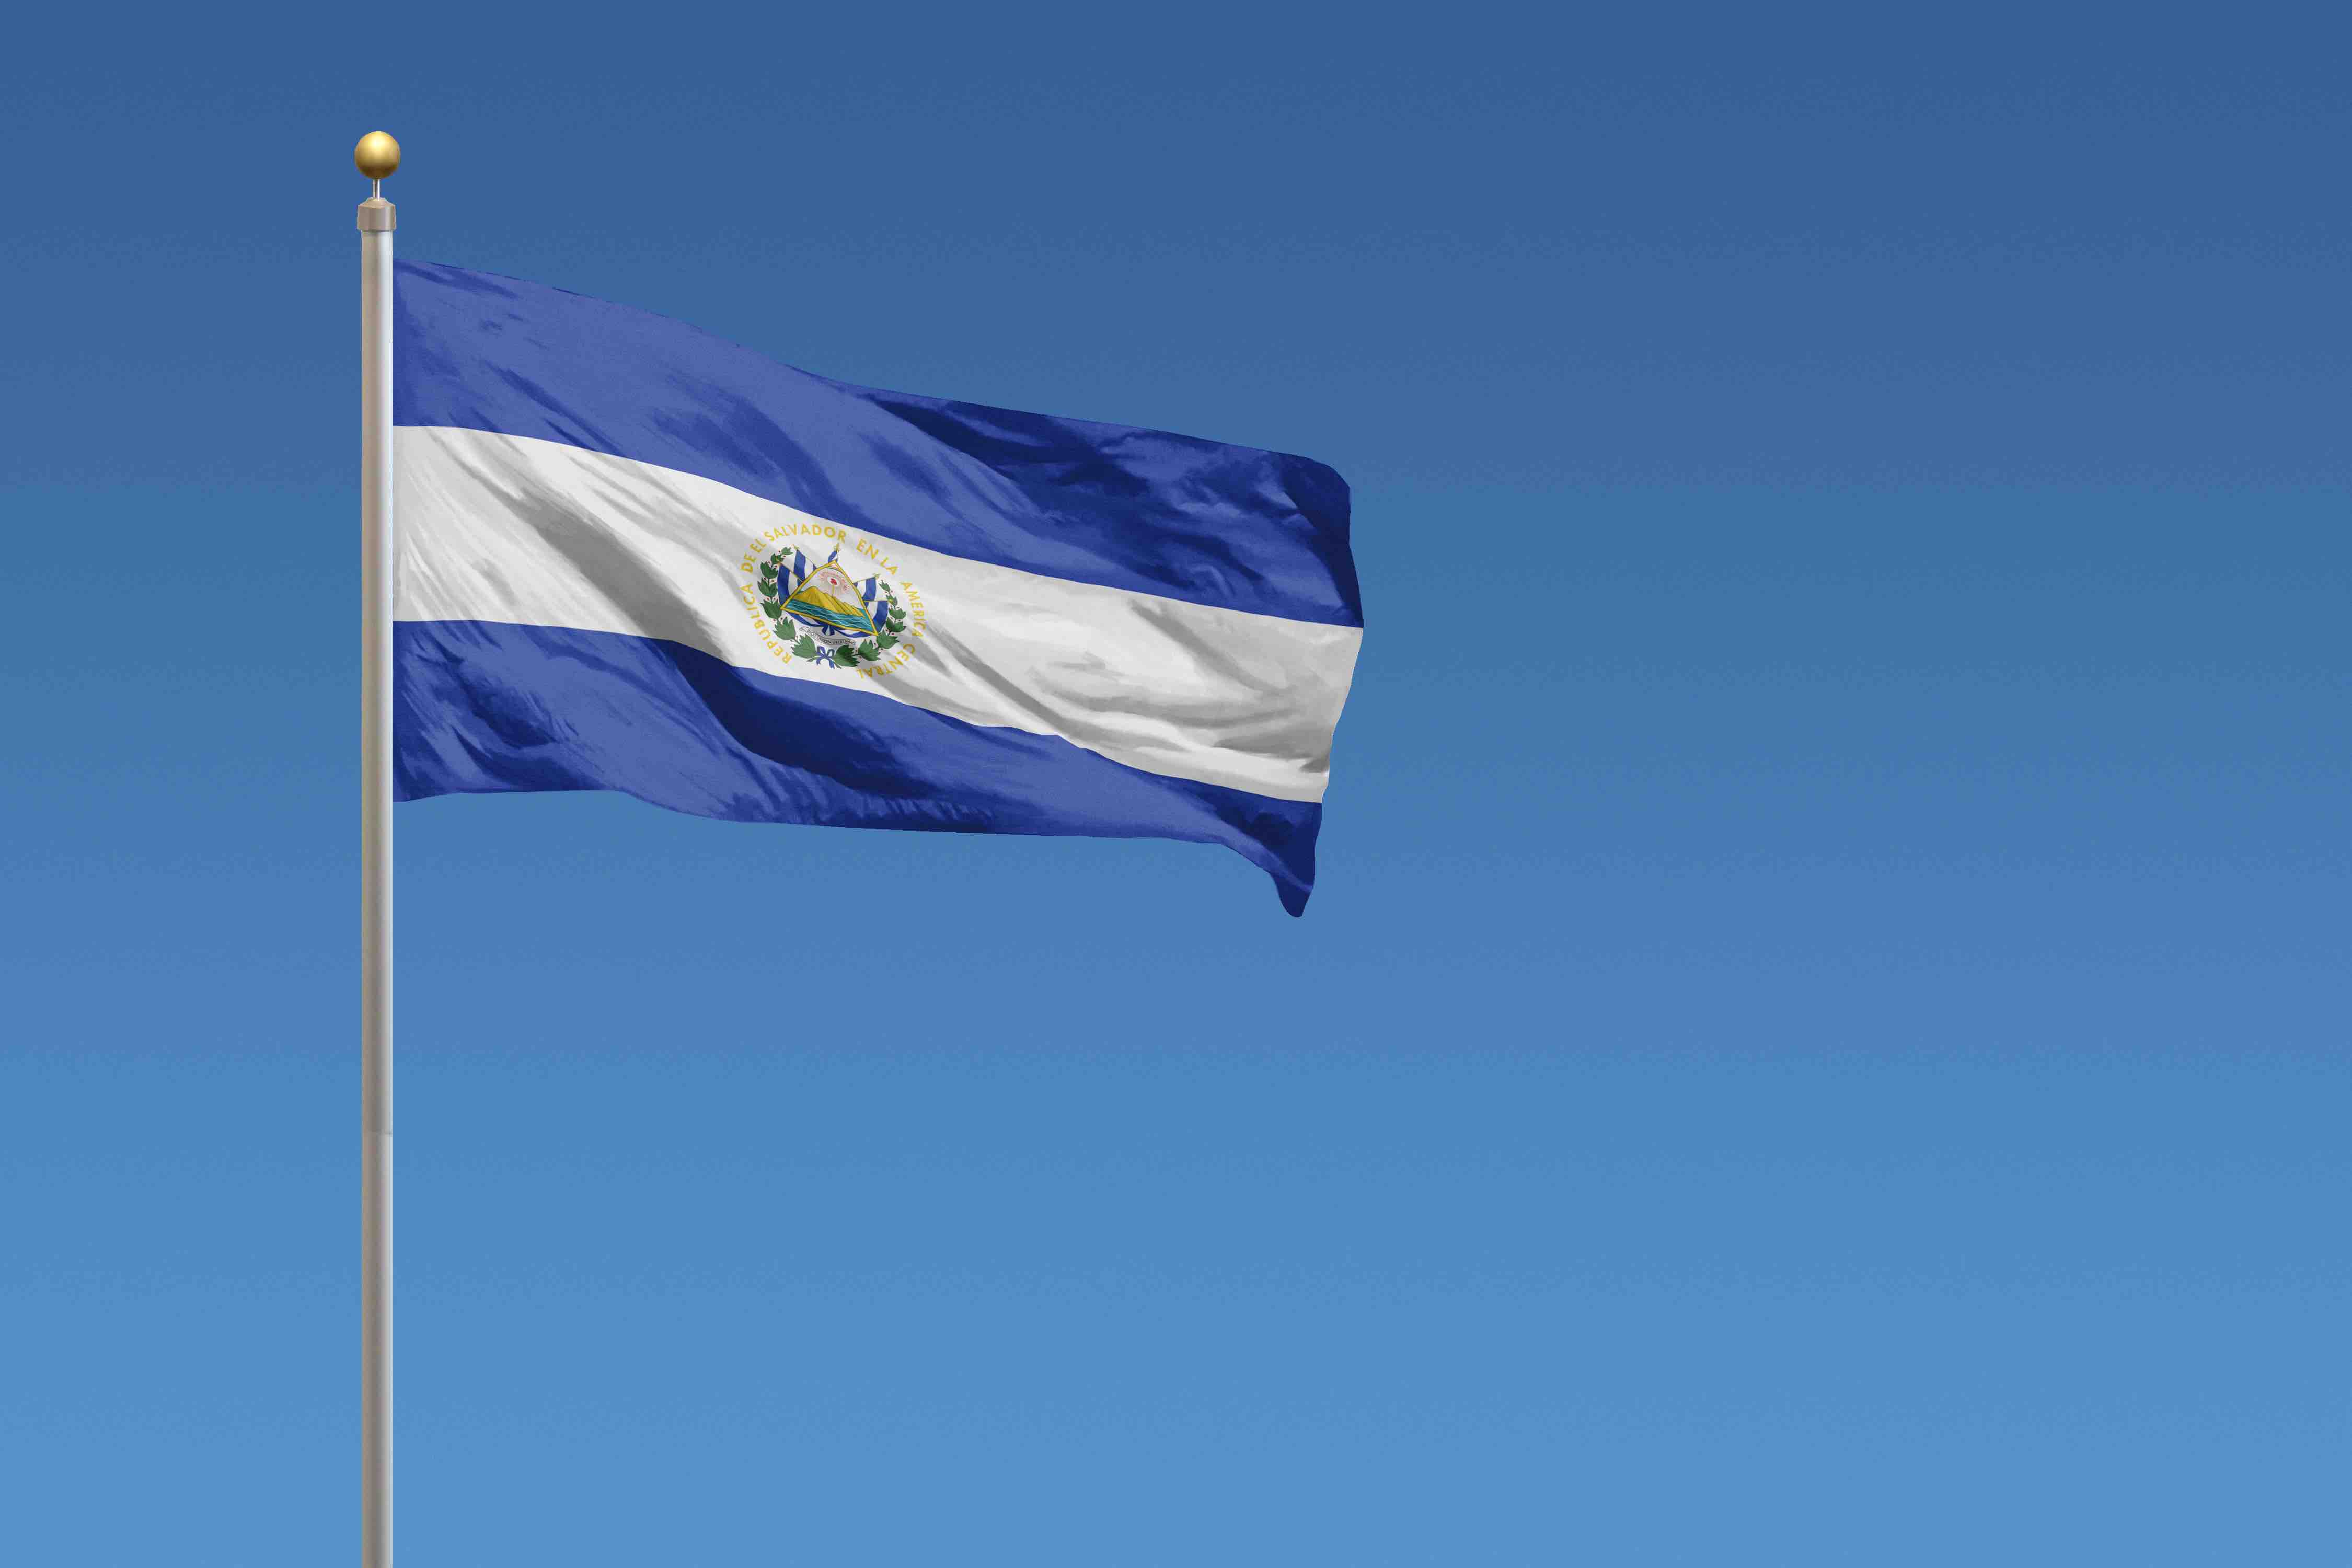 In El Salvador, the Murder of Trans Woman Anahy Miranda Rivas Spotlights Epidemic of LGBTQ Violence